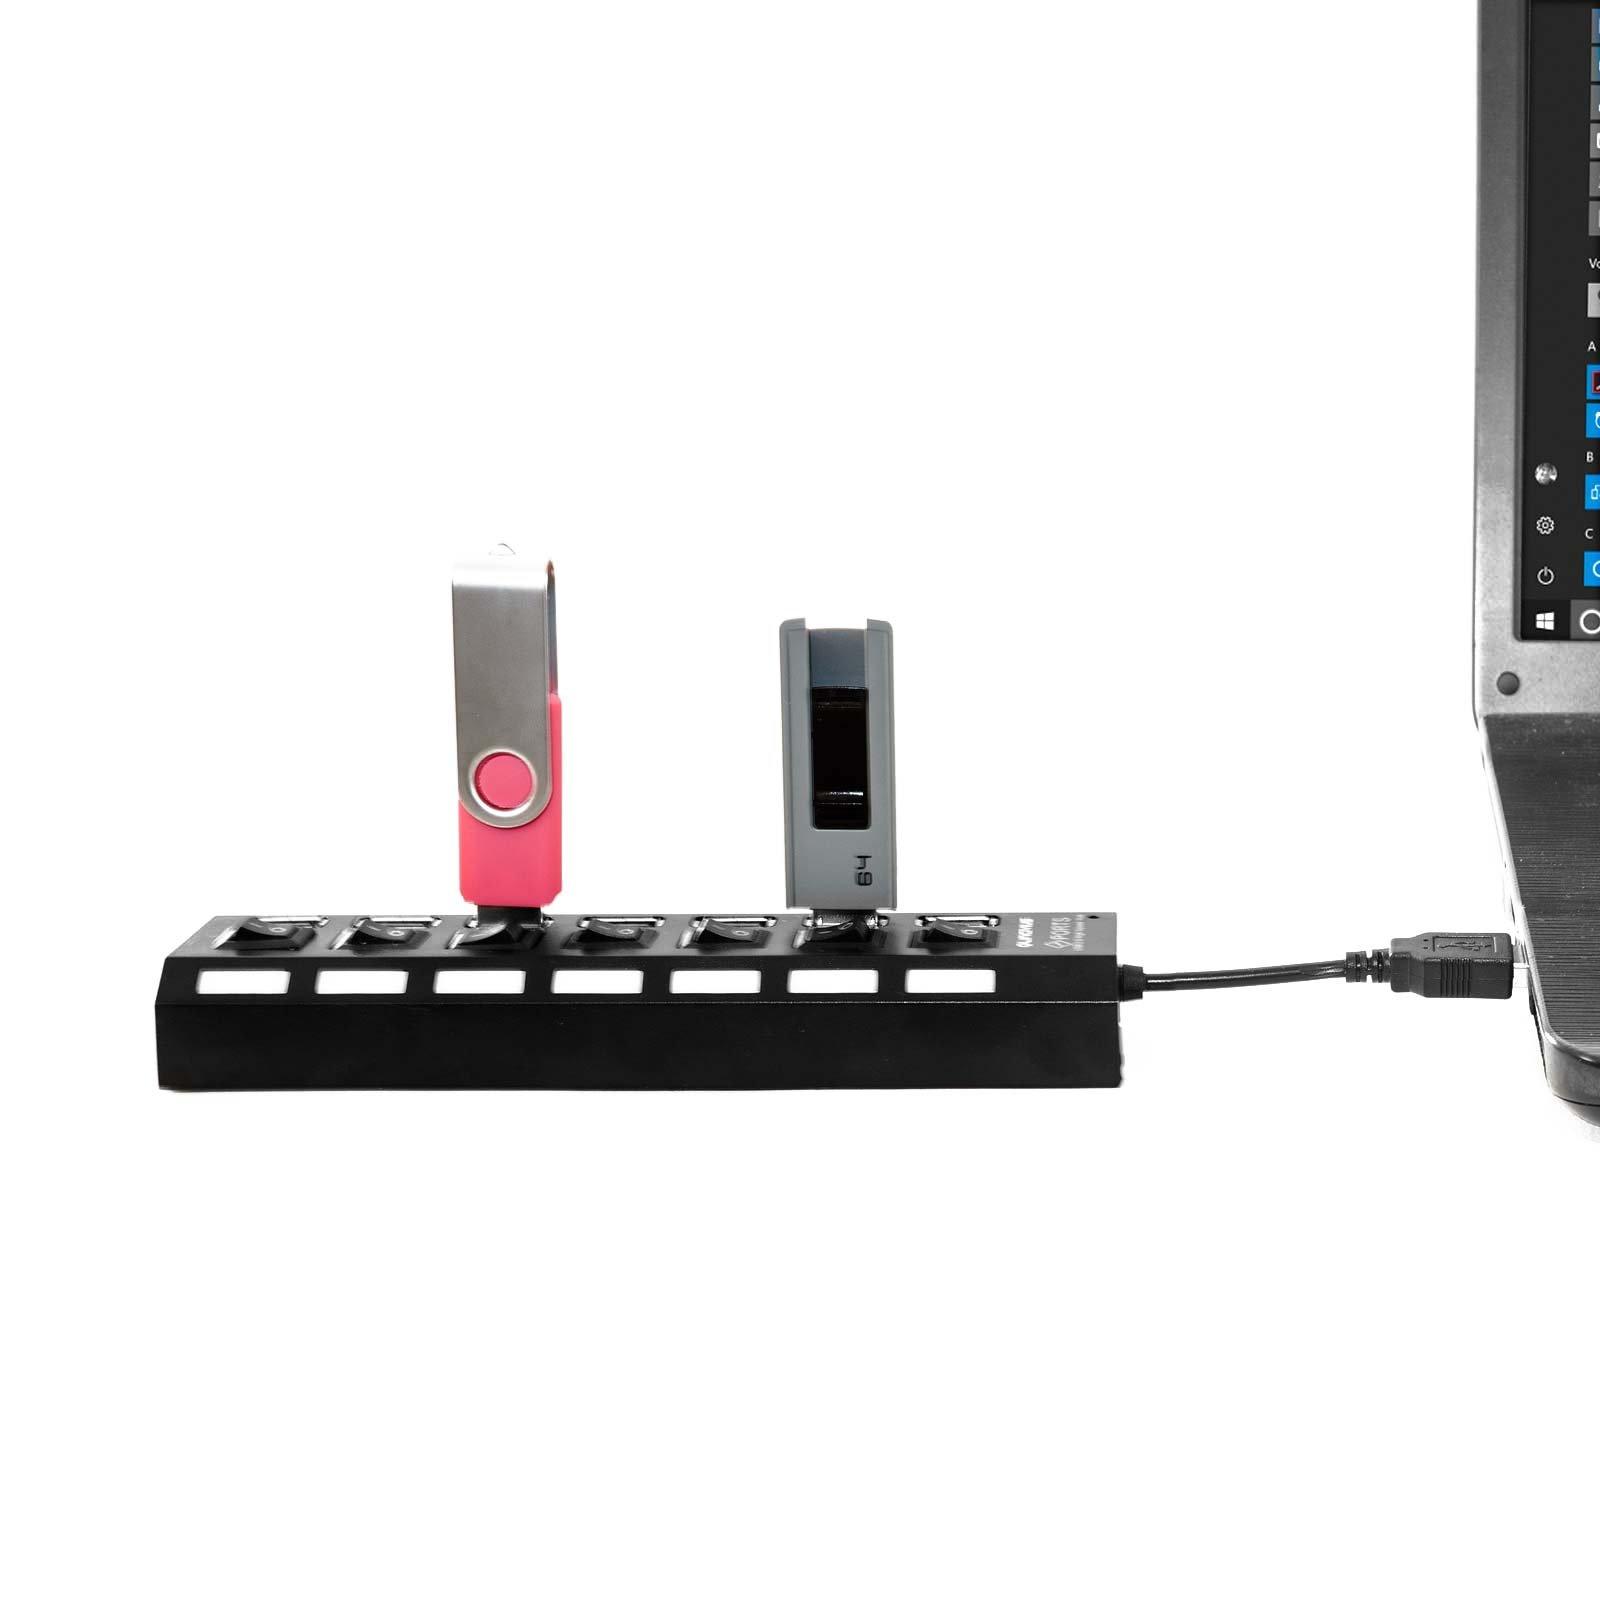 LINCIVIUS  USB Hub, Adaptateur hub USB avec 7 Ports USB, Mini Hub USB Coloris Noir, Original [Garantie à Vie]